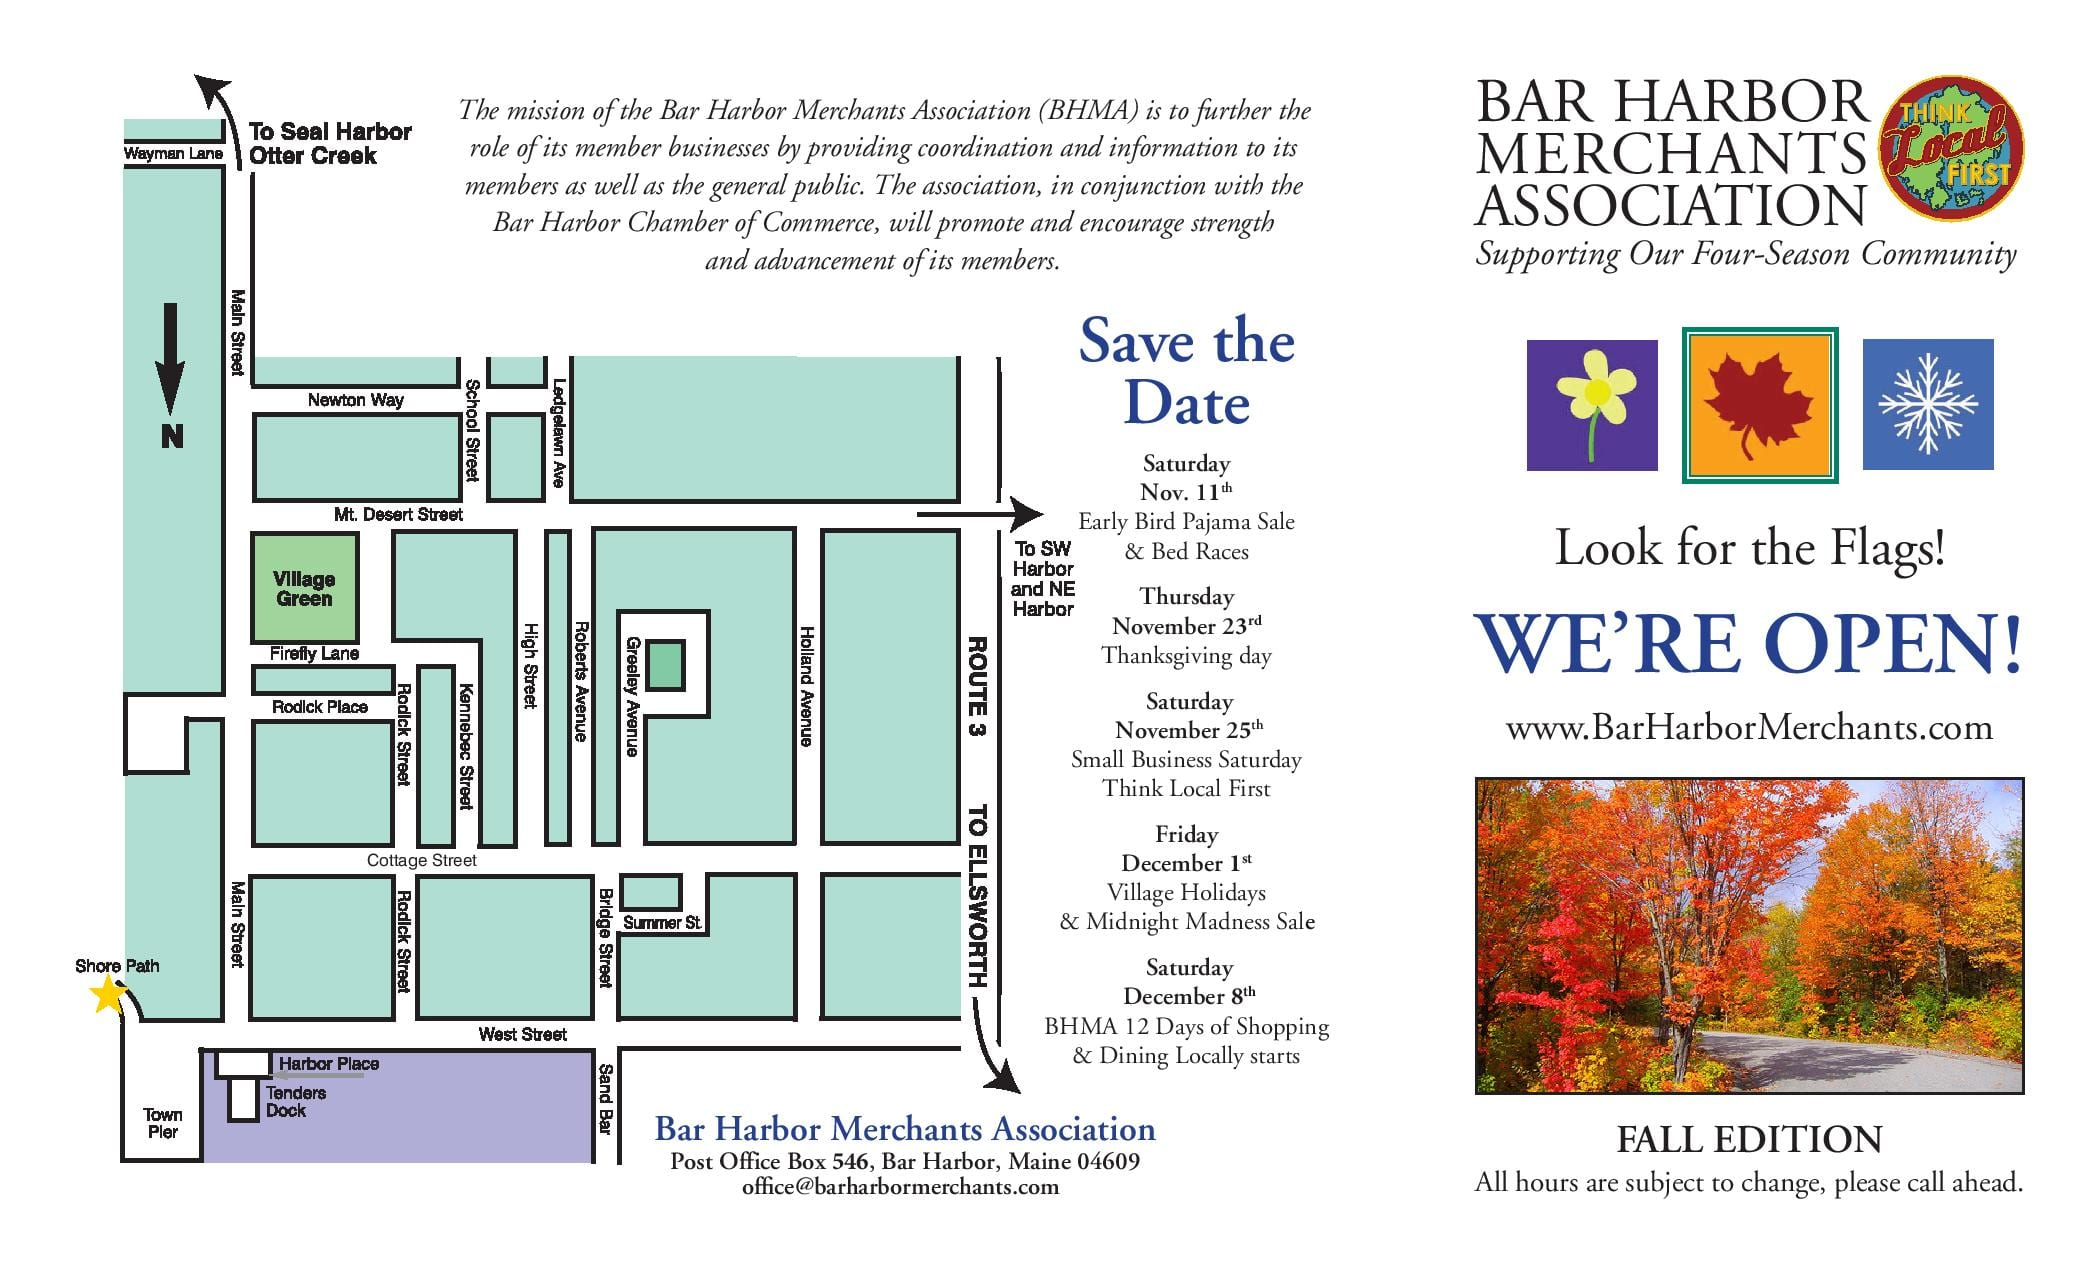 Bar Harbor Merchants Open Directory, Fall 2016